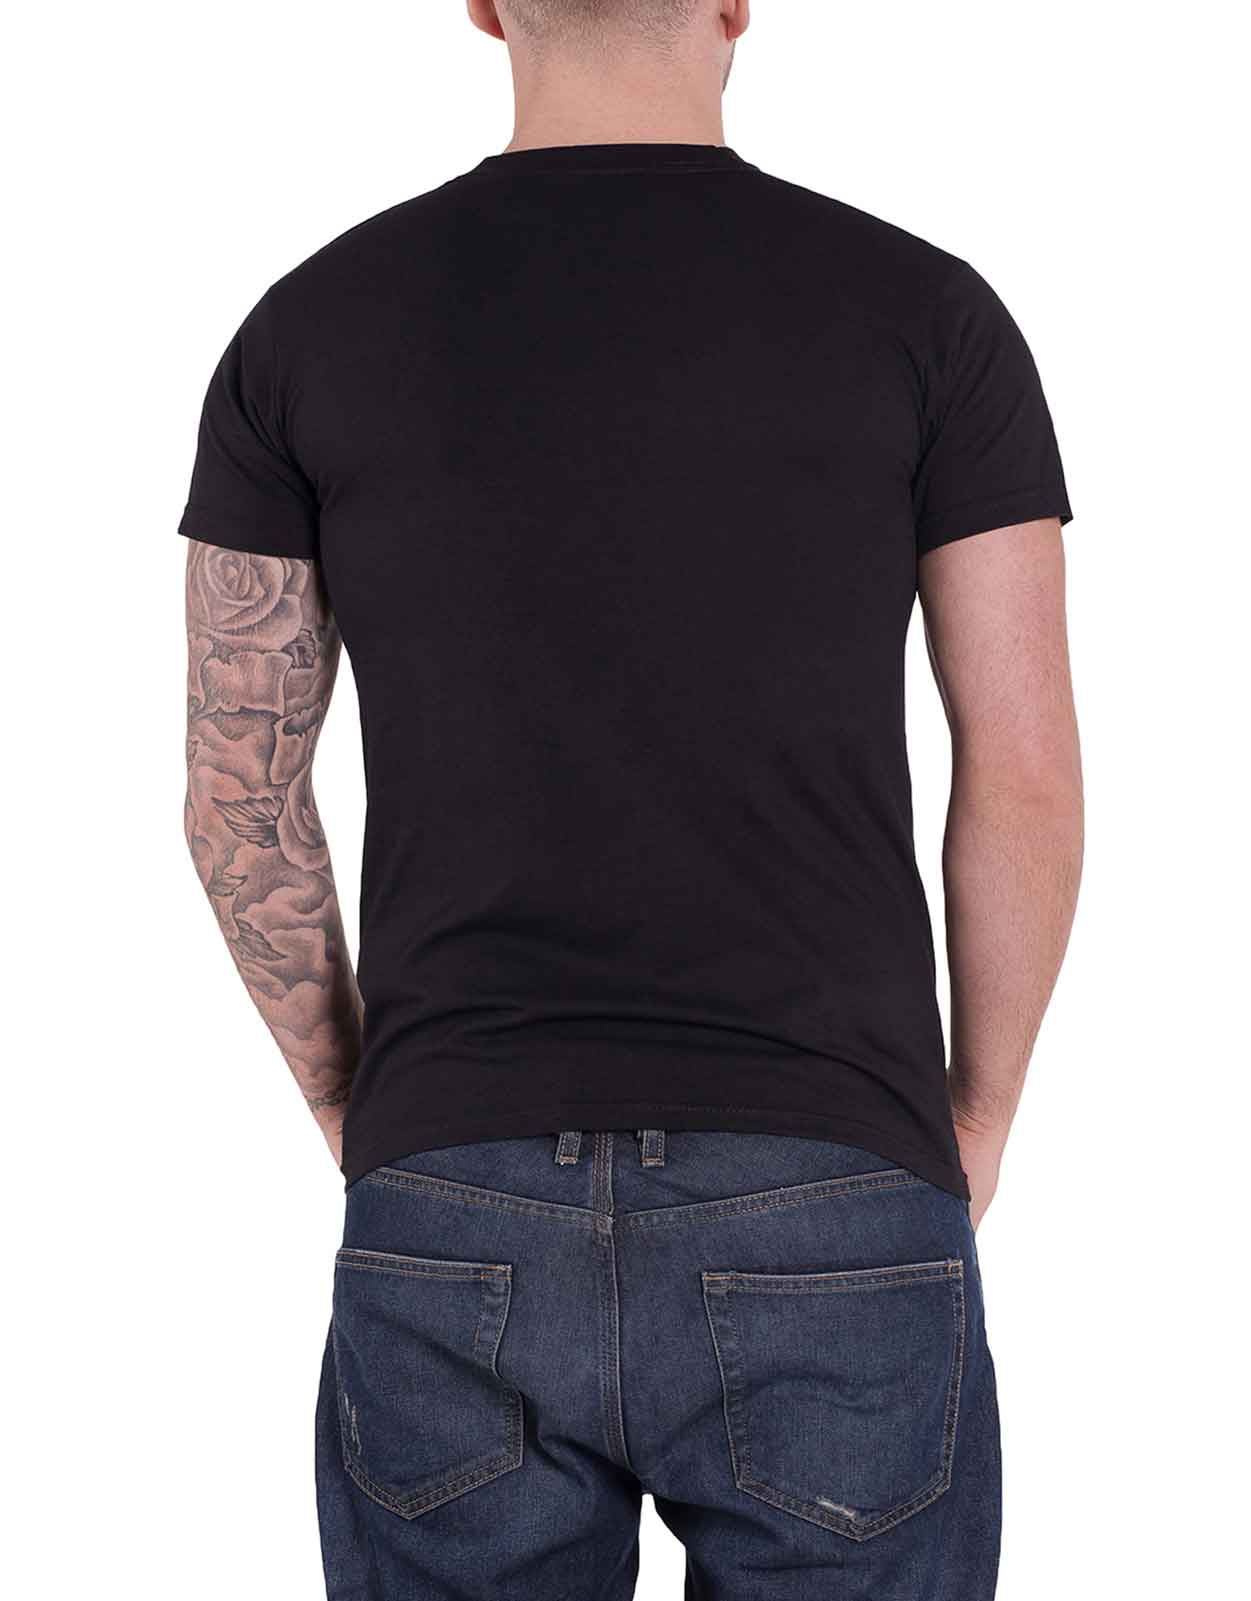 Official-Motley-Crue-T-Shirt-Shout-at-the-Devil-The-Dirt-Tour-Band-Logo-Mens thumbnail 33